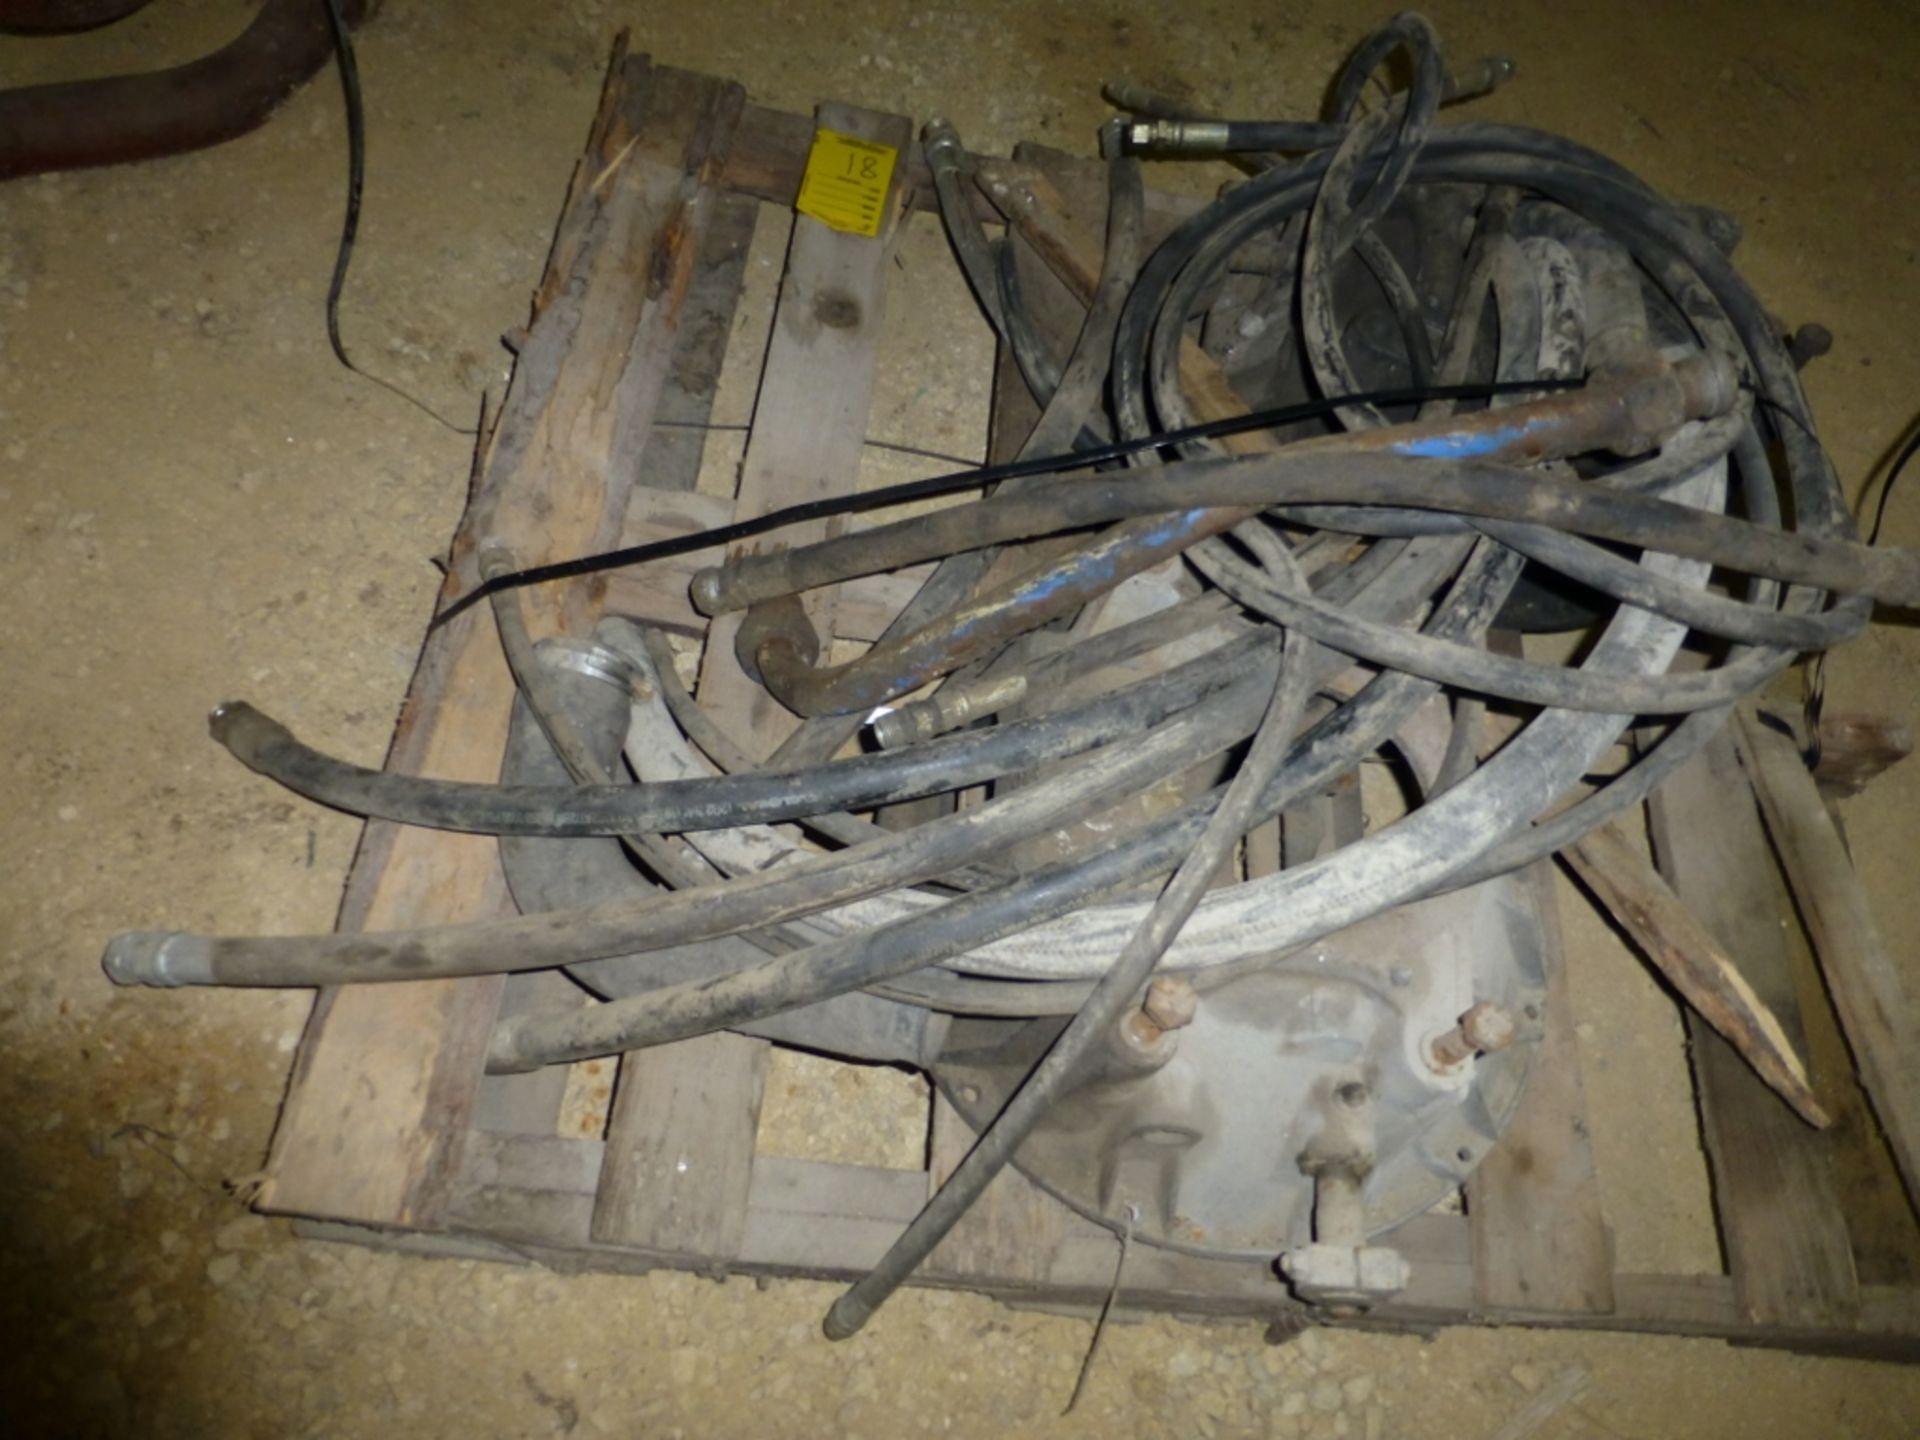 Pallet w/wheel hubs, hyd hose - Image 2 of 2